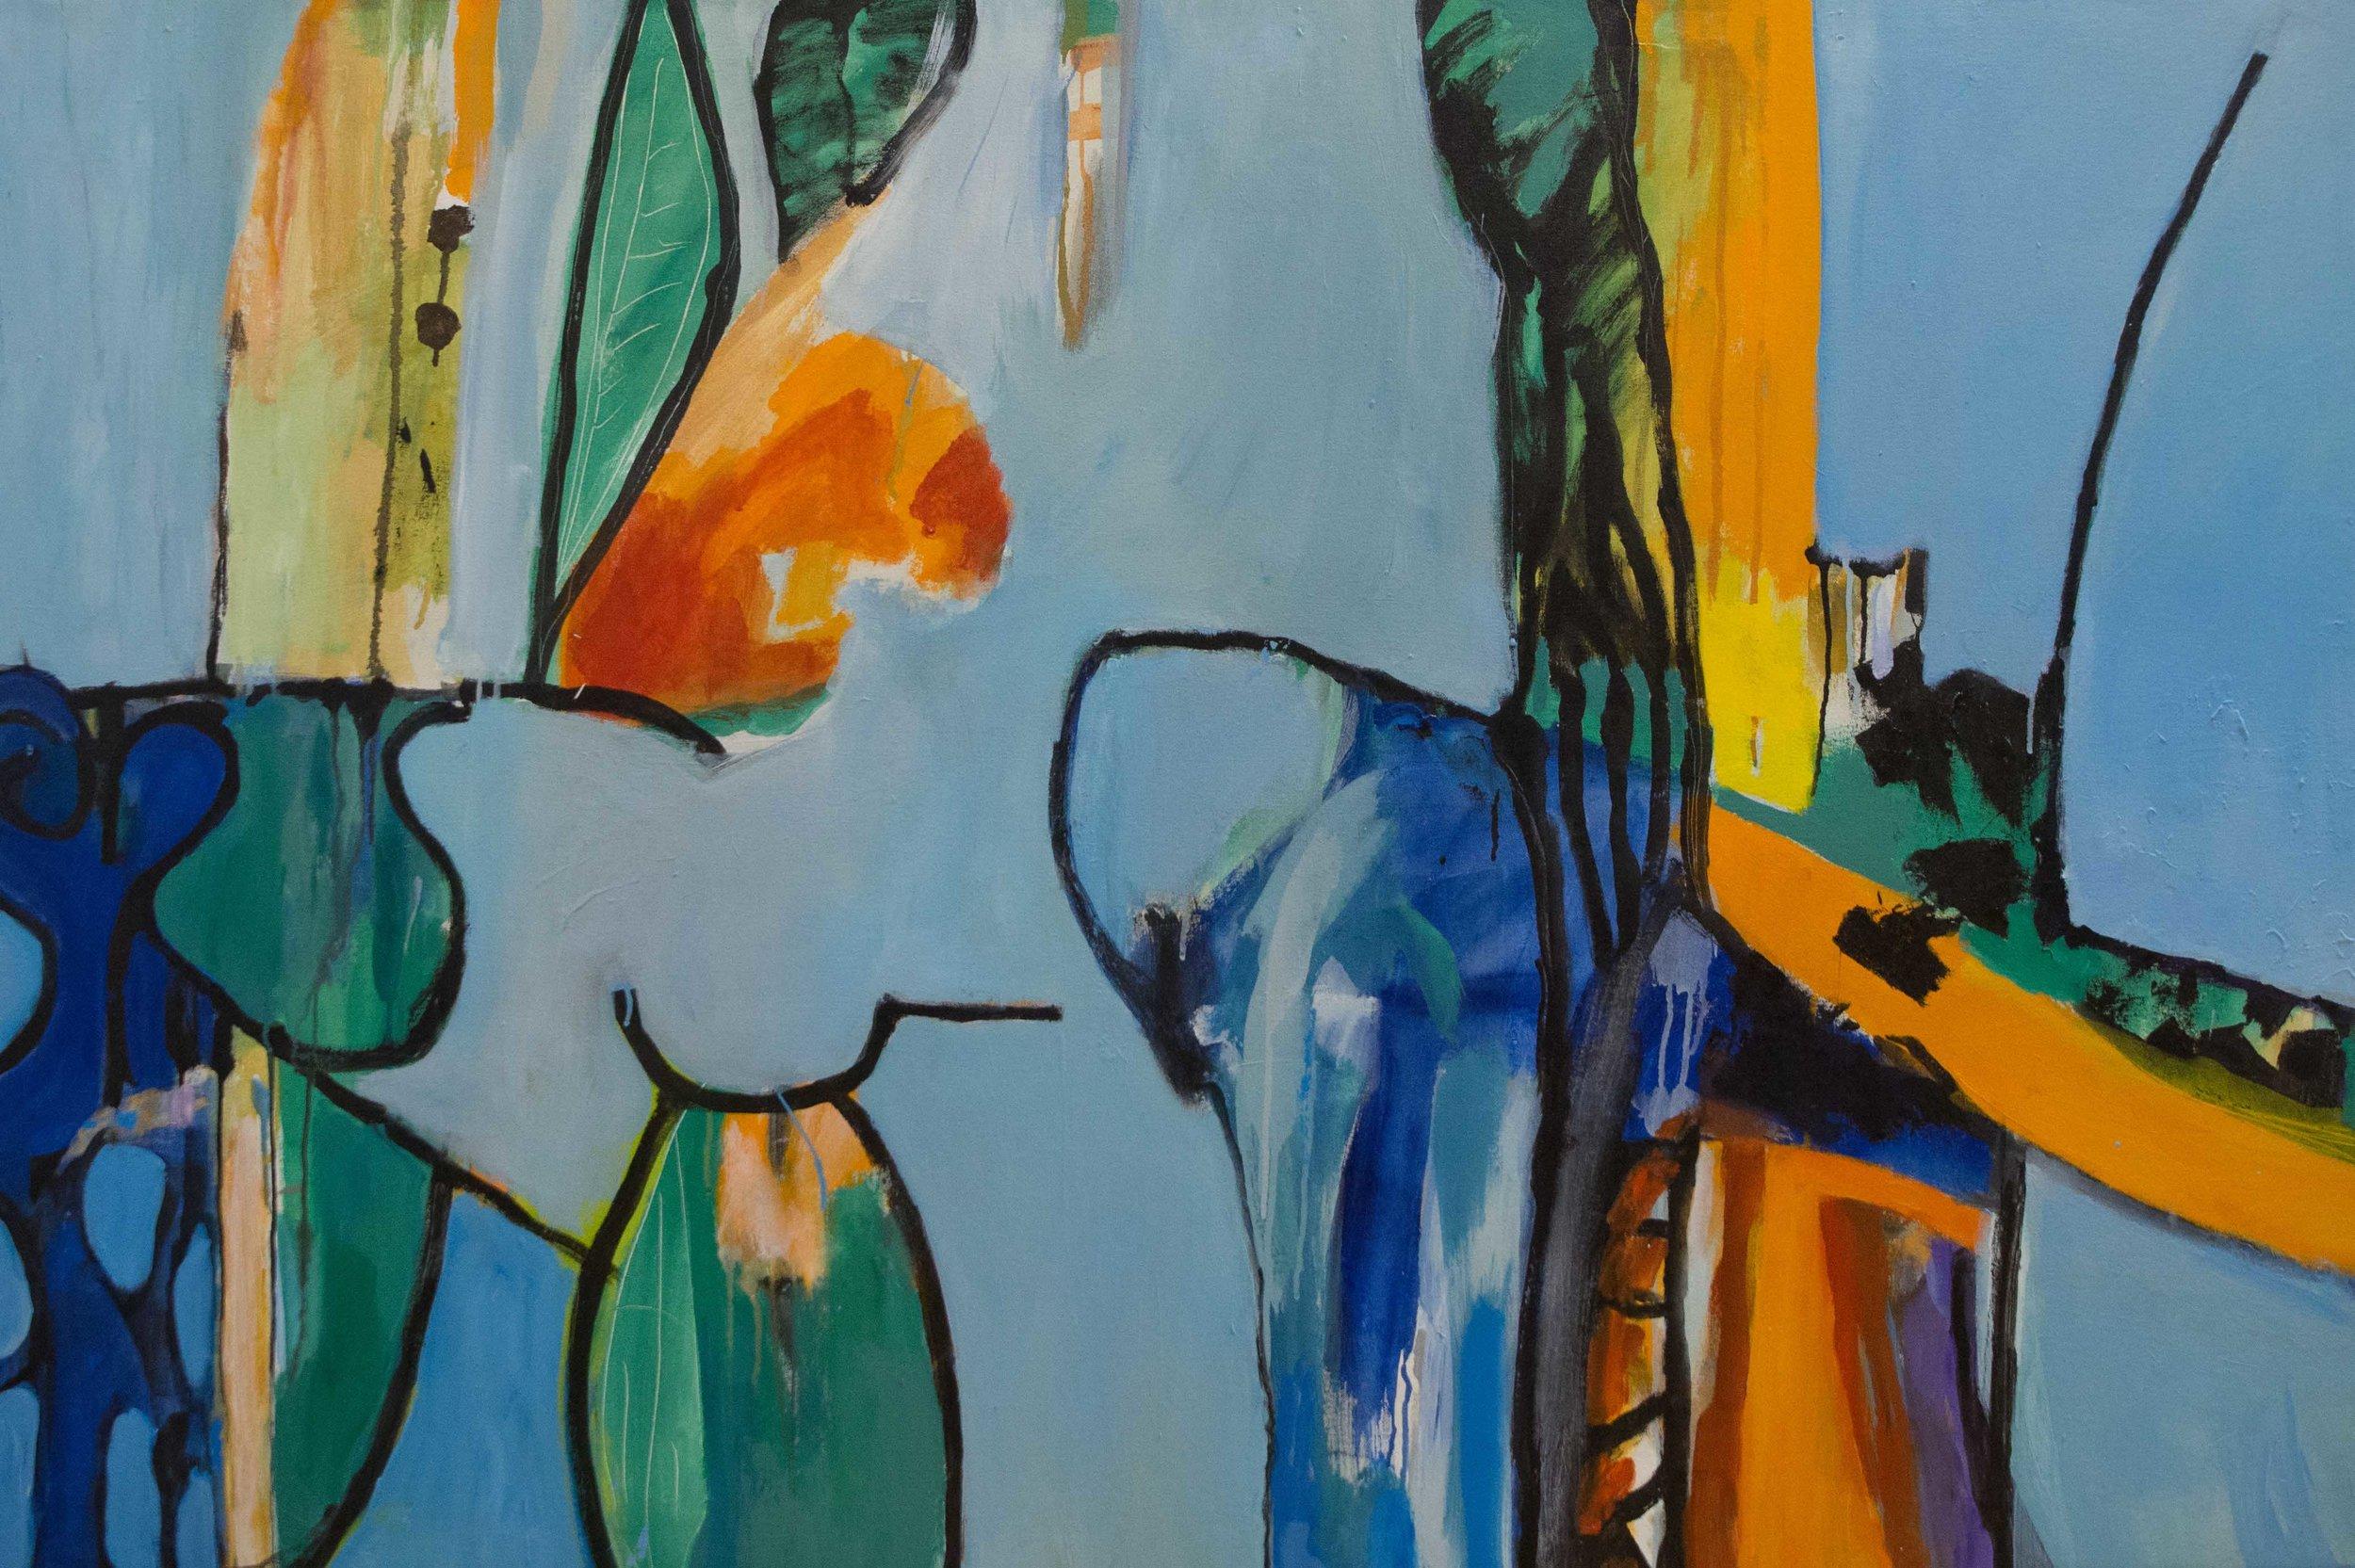 Growthing , 2006 Acrylic on canvas 45 x 62 in. (114 x 157 cm.) Photography courtesy of Joshua DeMello